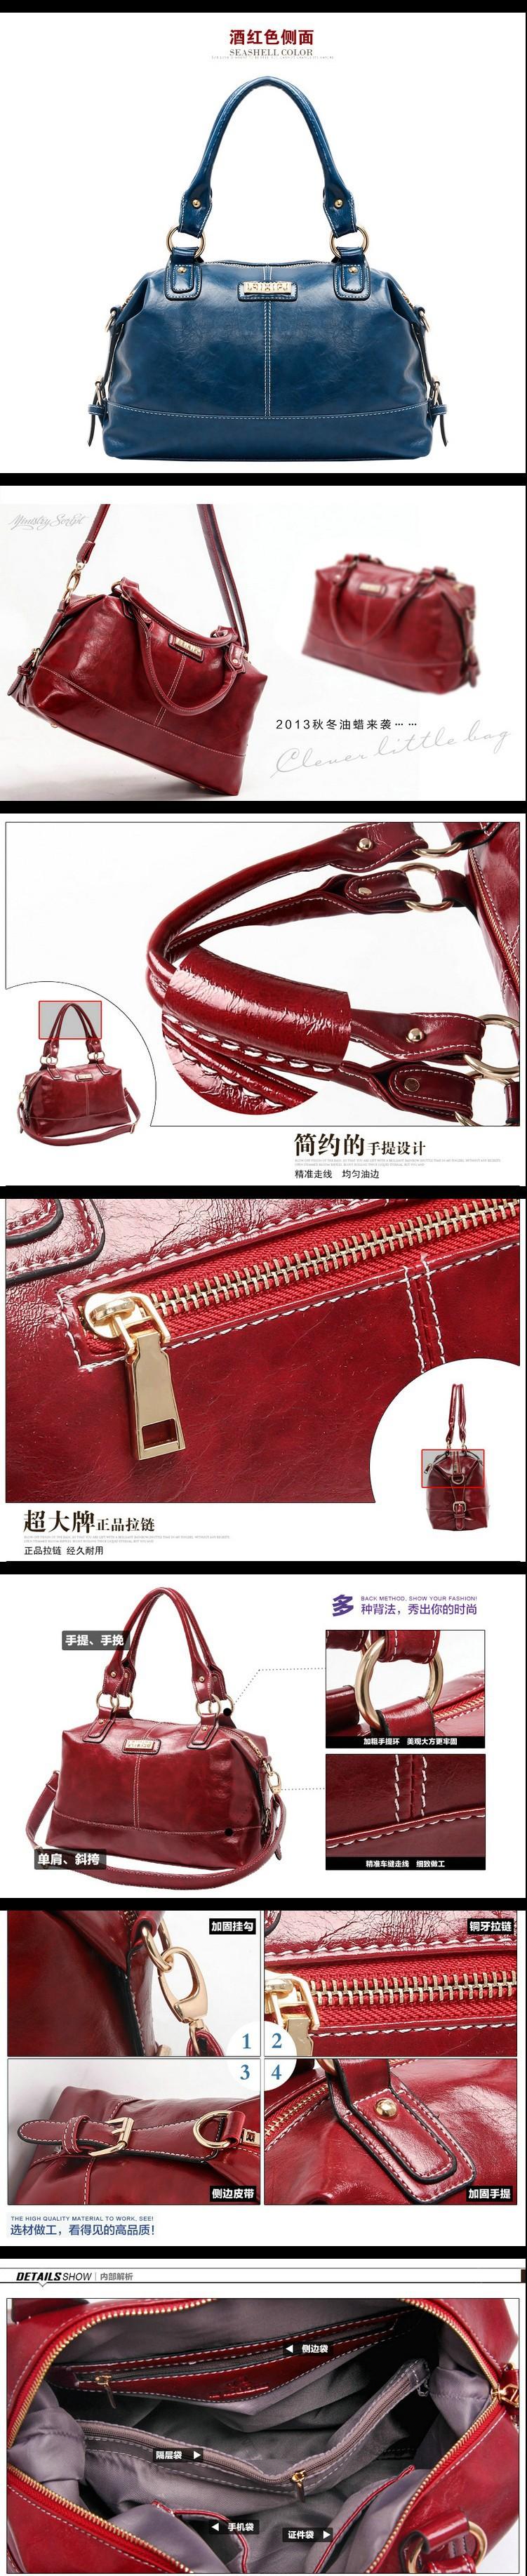 HOT 2014 Fashion Women Genuine Leather Handbags Famous Brand Cowhide